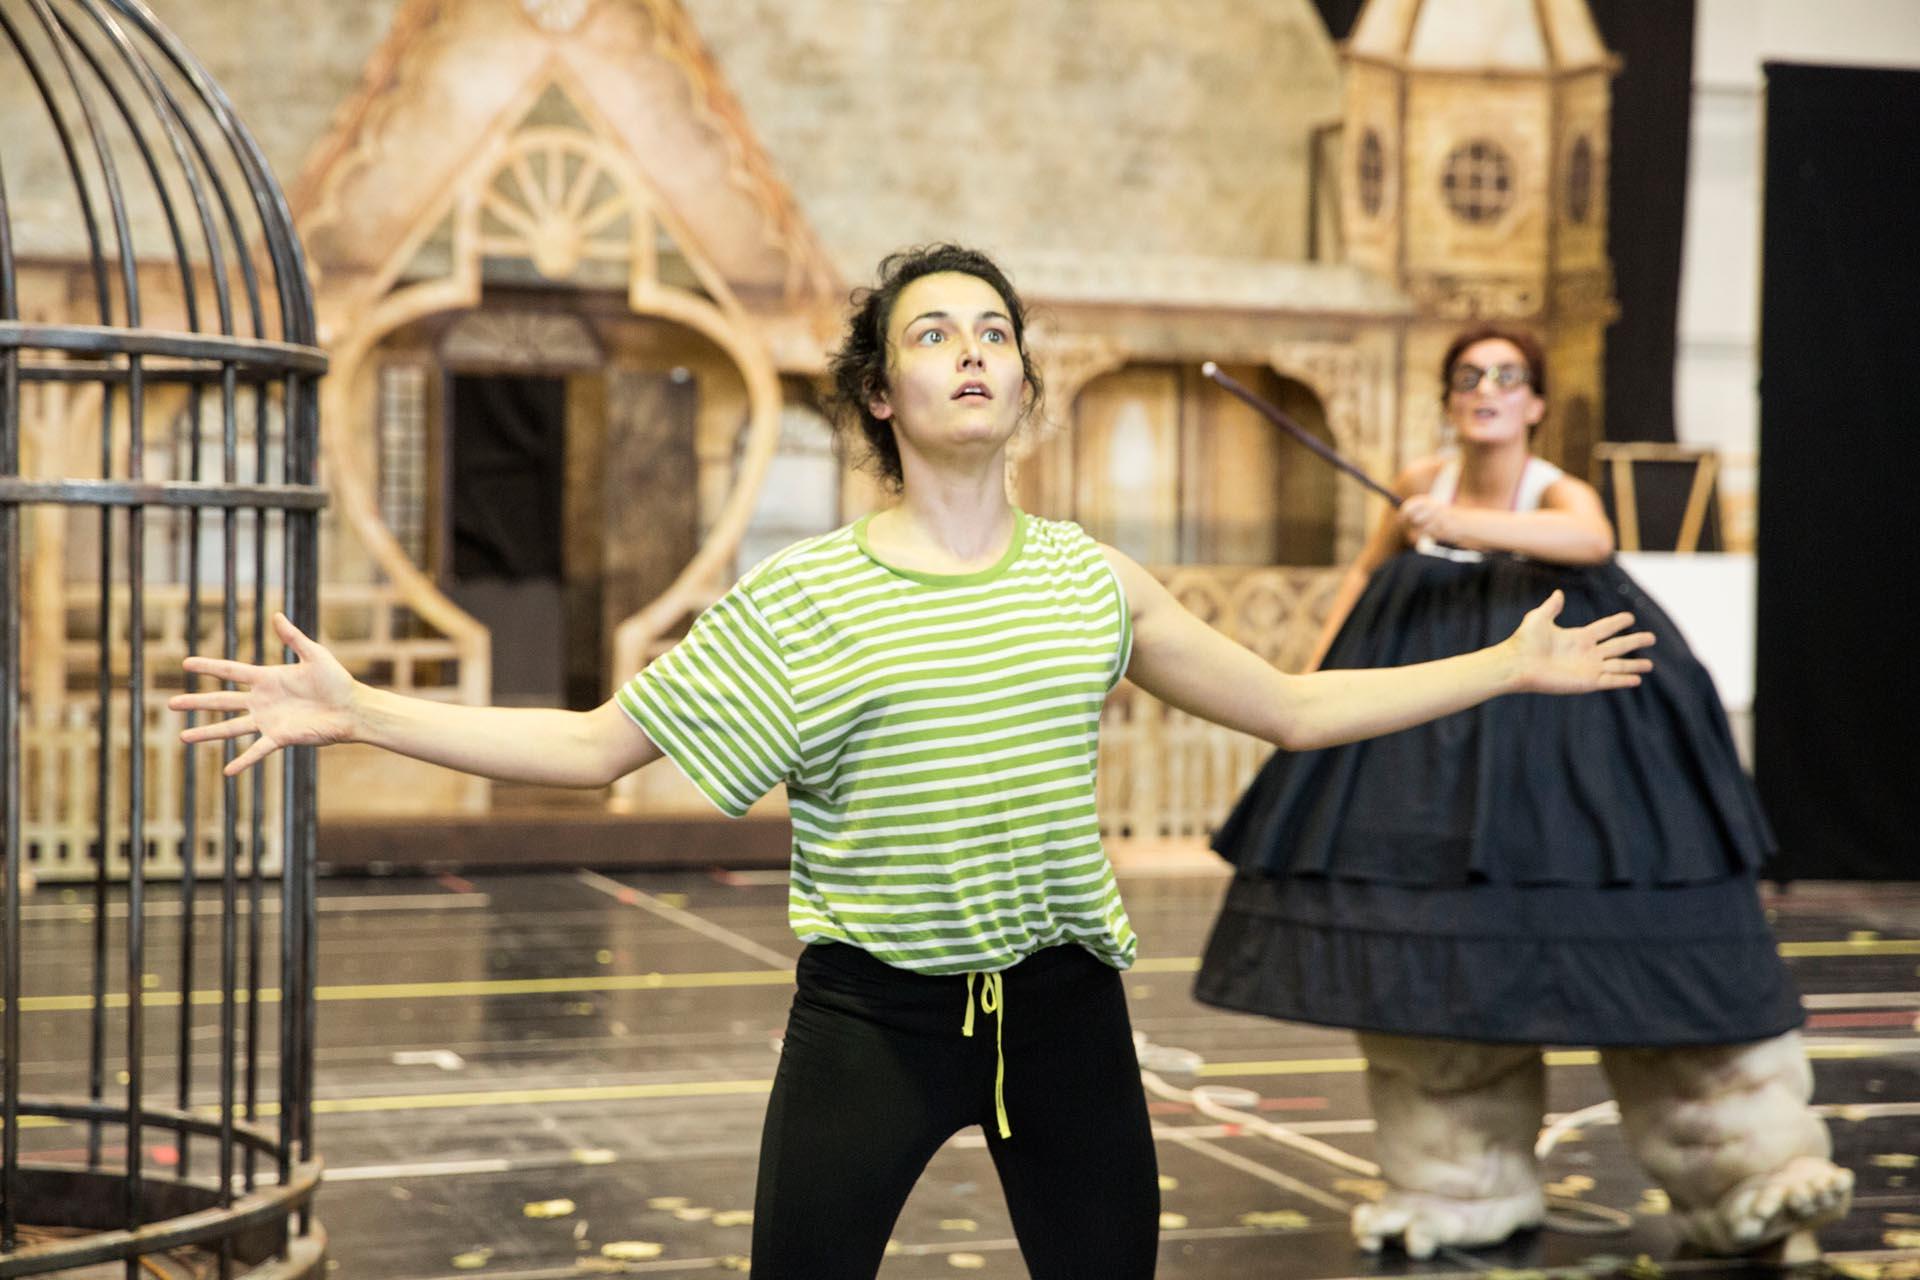 03 Hänsel und Gretel, Teatro alla Scala, 2017, © Brescia und Amisano